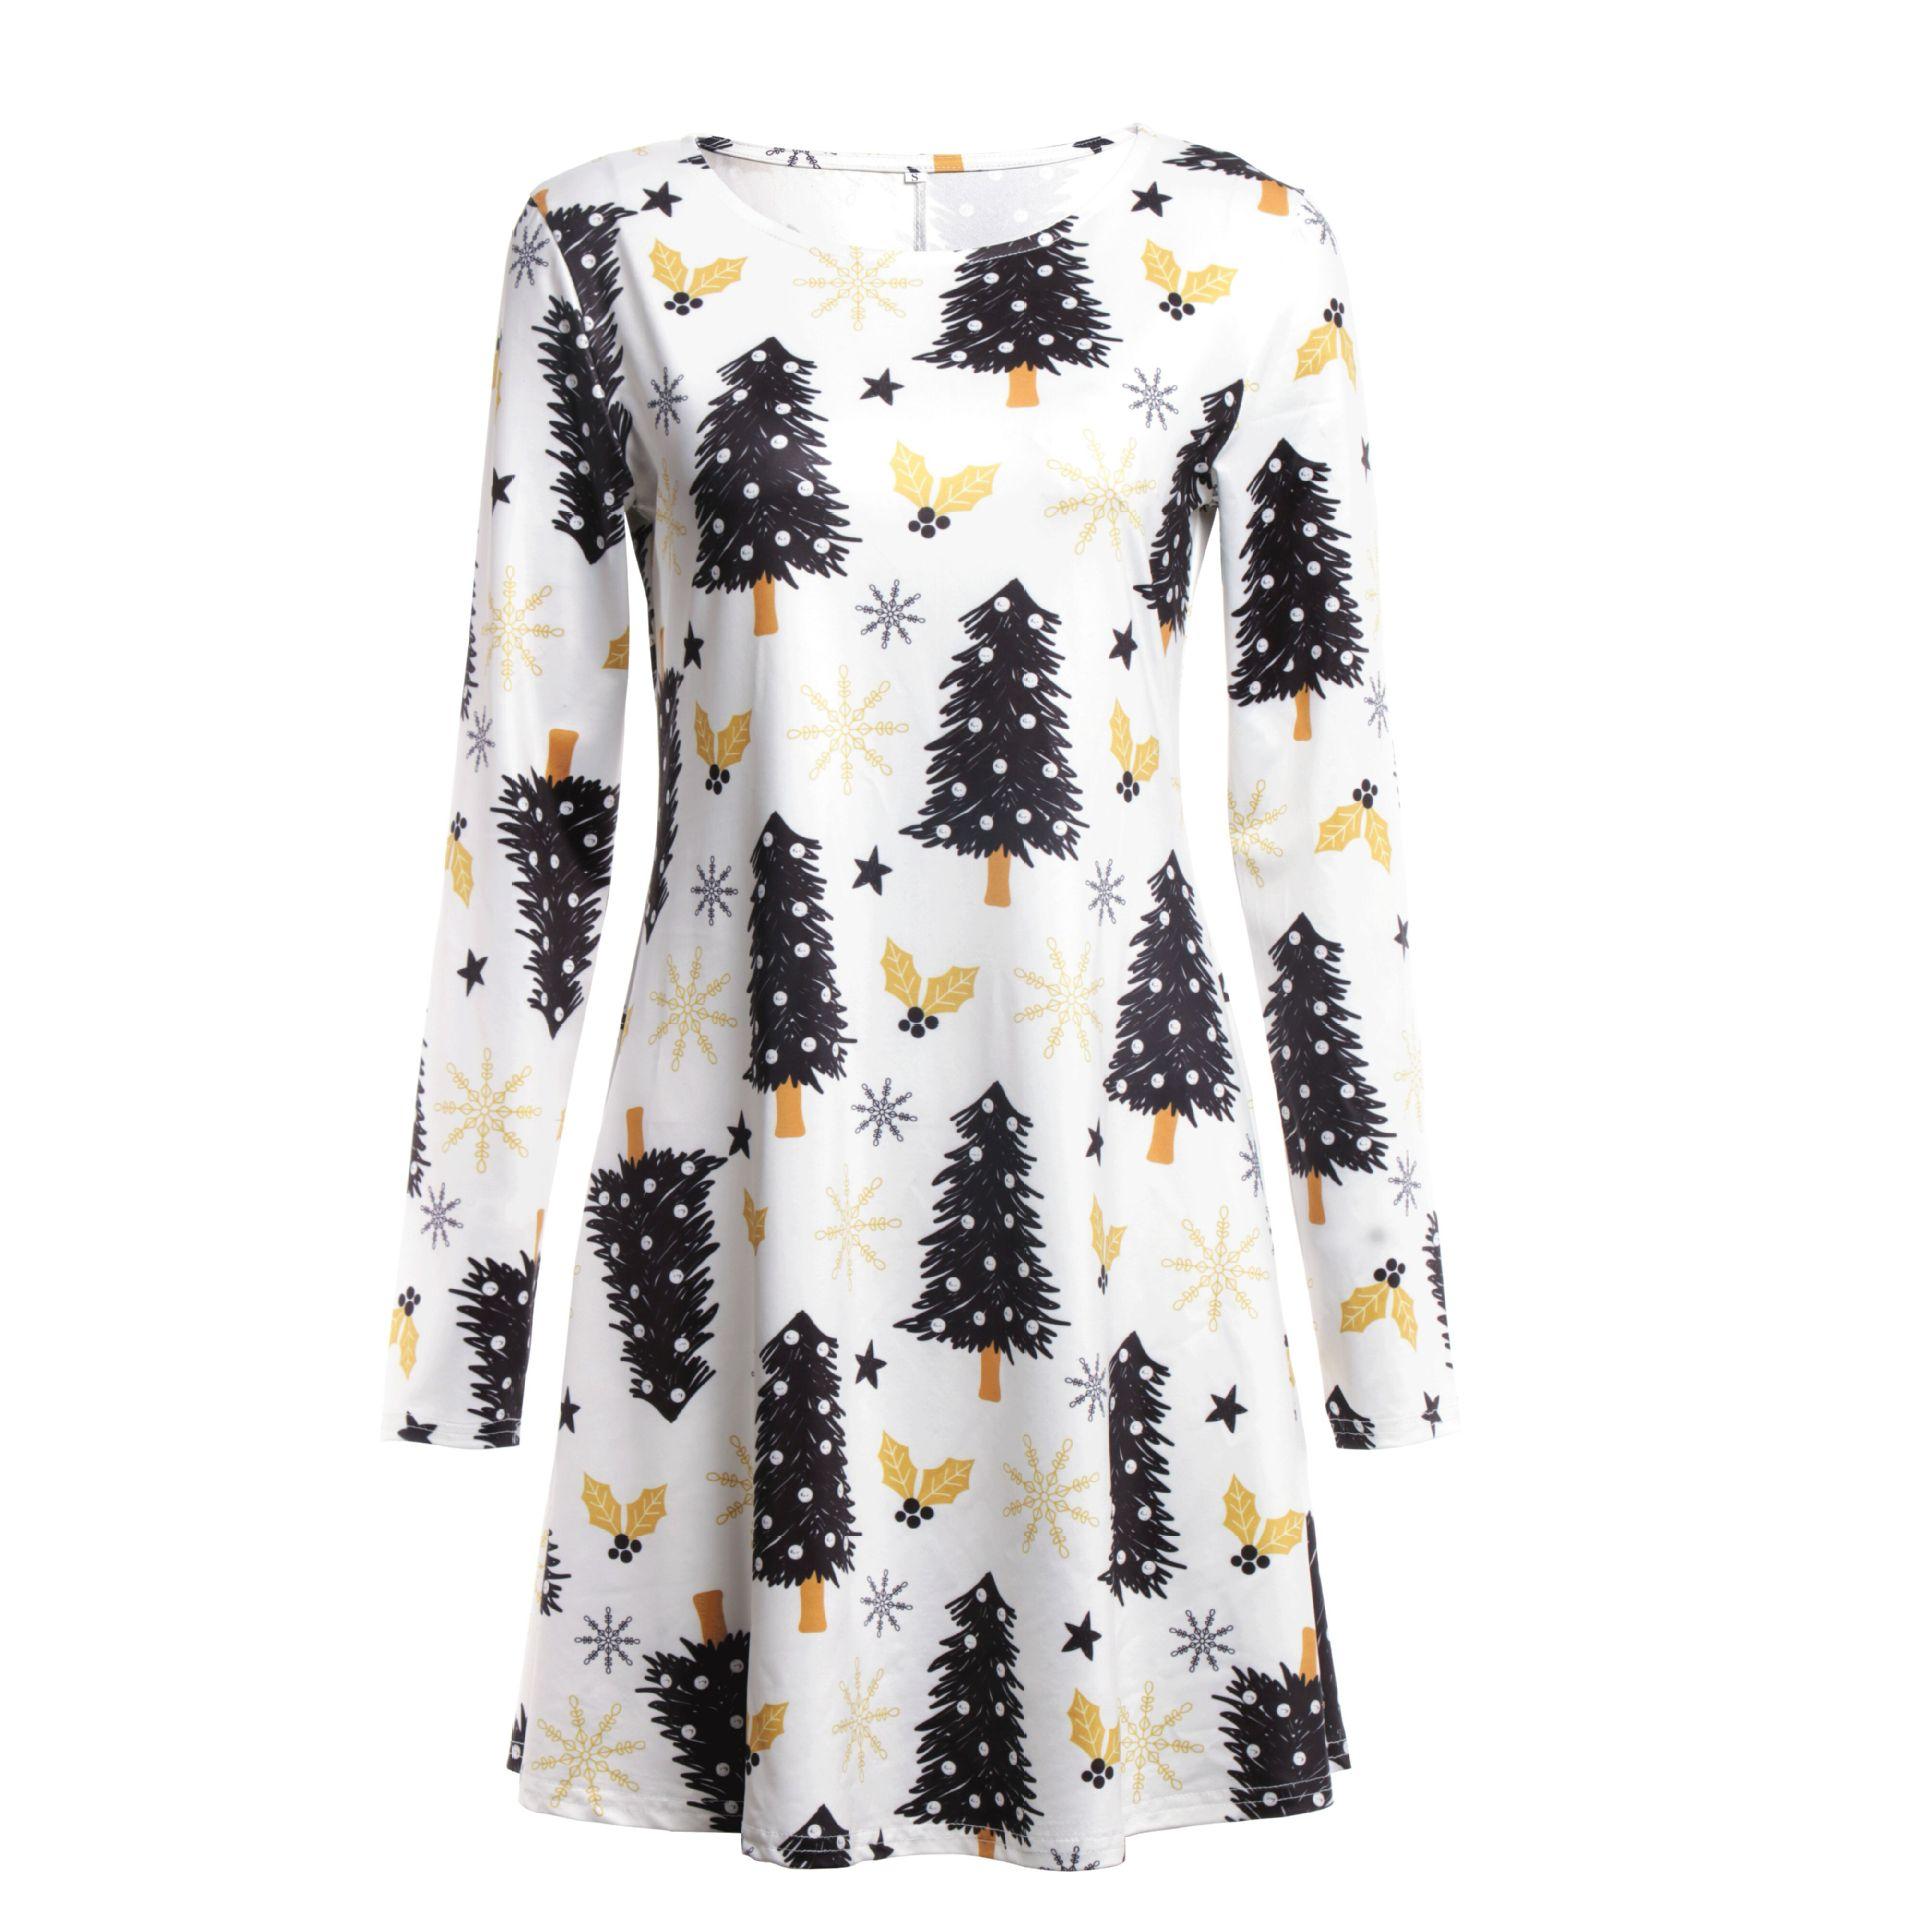 Print Long Sleeve Autumn Winter Christmas Dress Women 19 Casual Loose Short Party Dress Plus Size S-5XL Vestidos 3